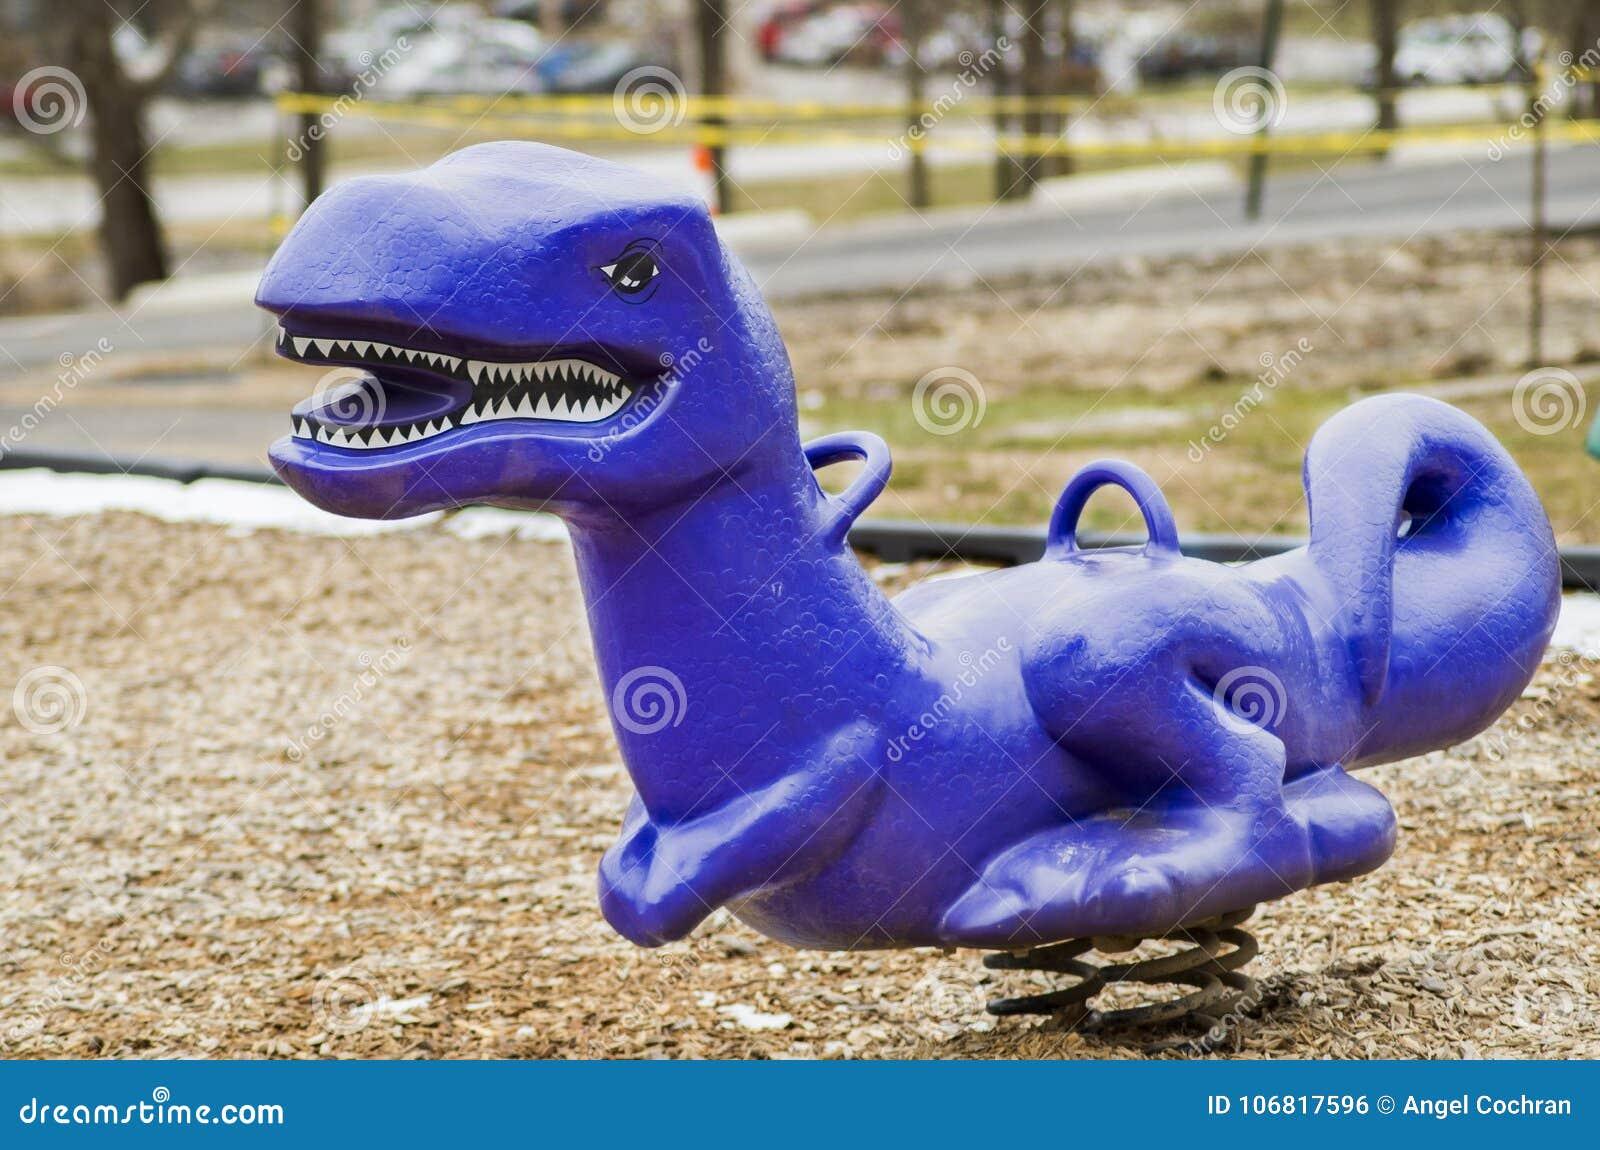 Dinosaur say Roar, at a childrens playground